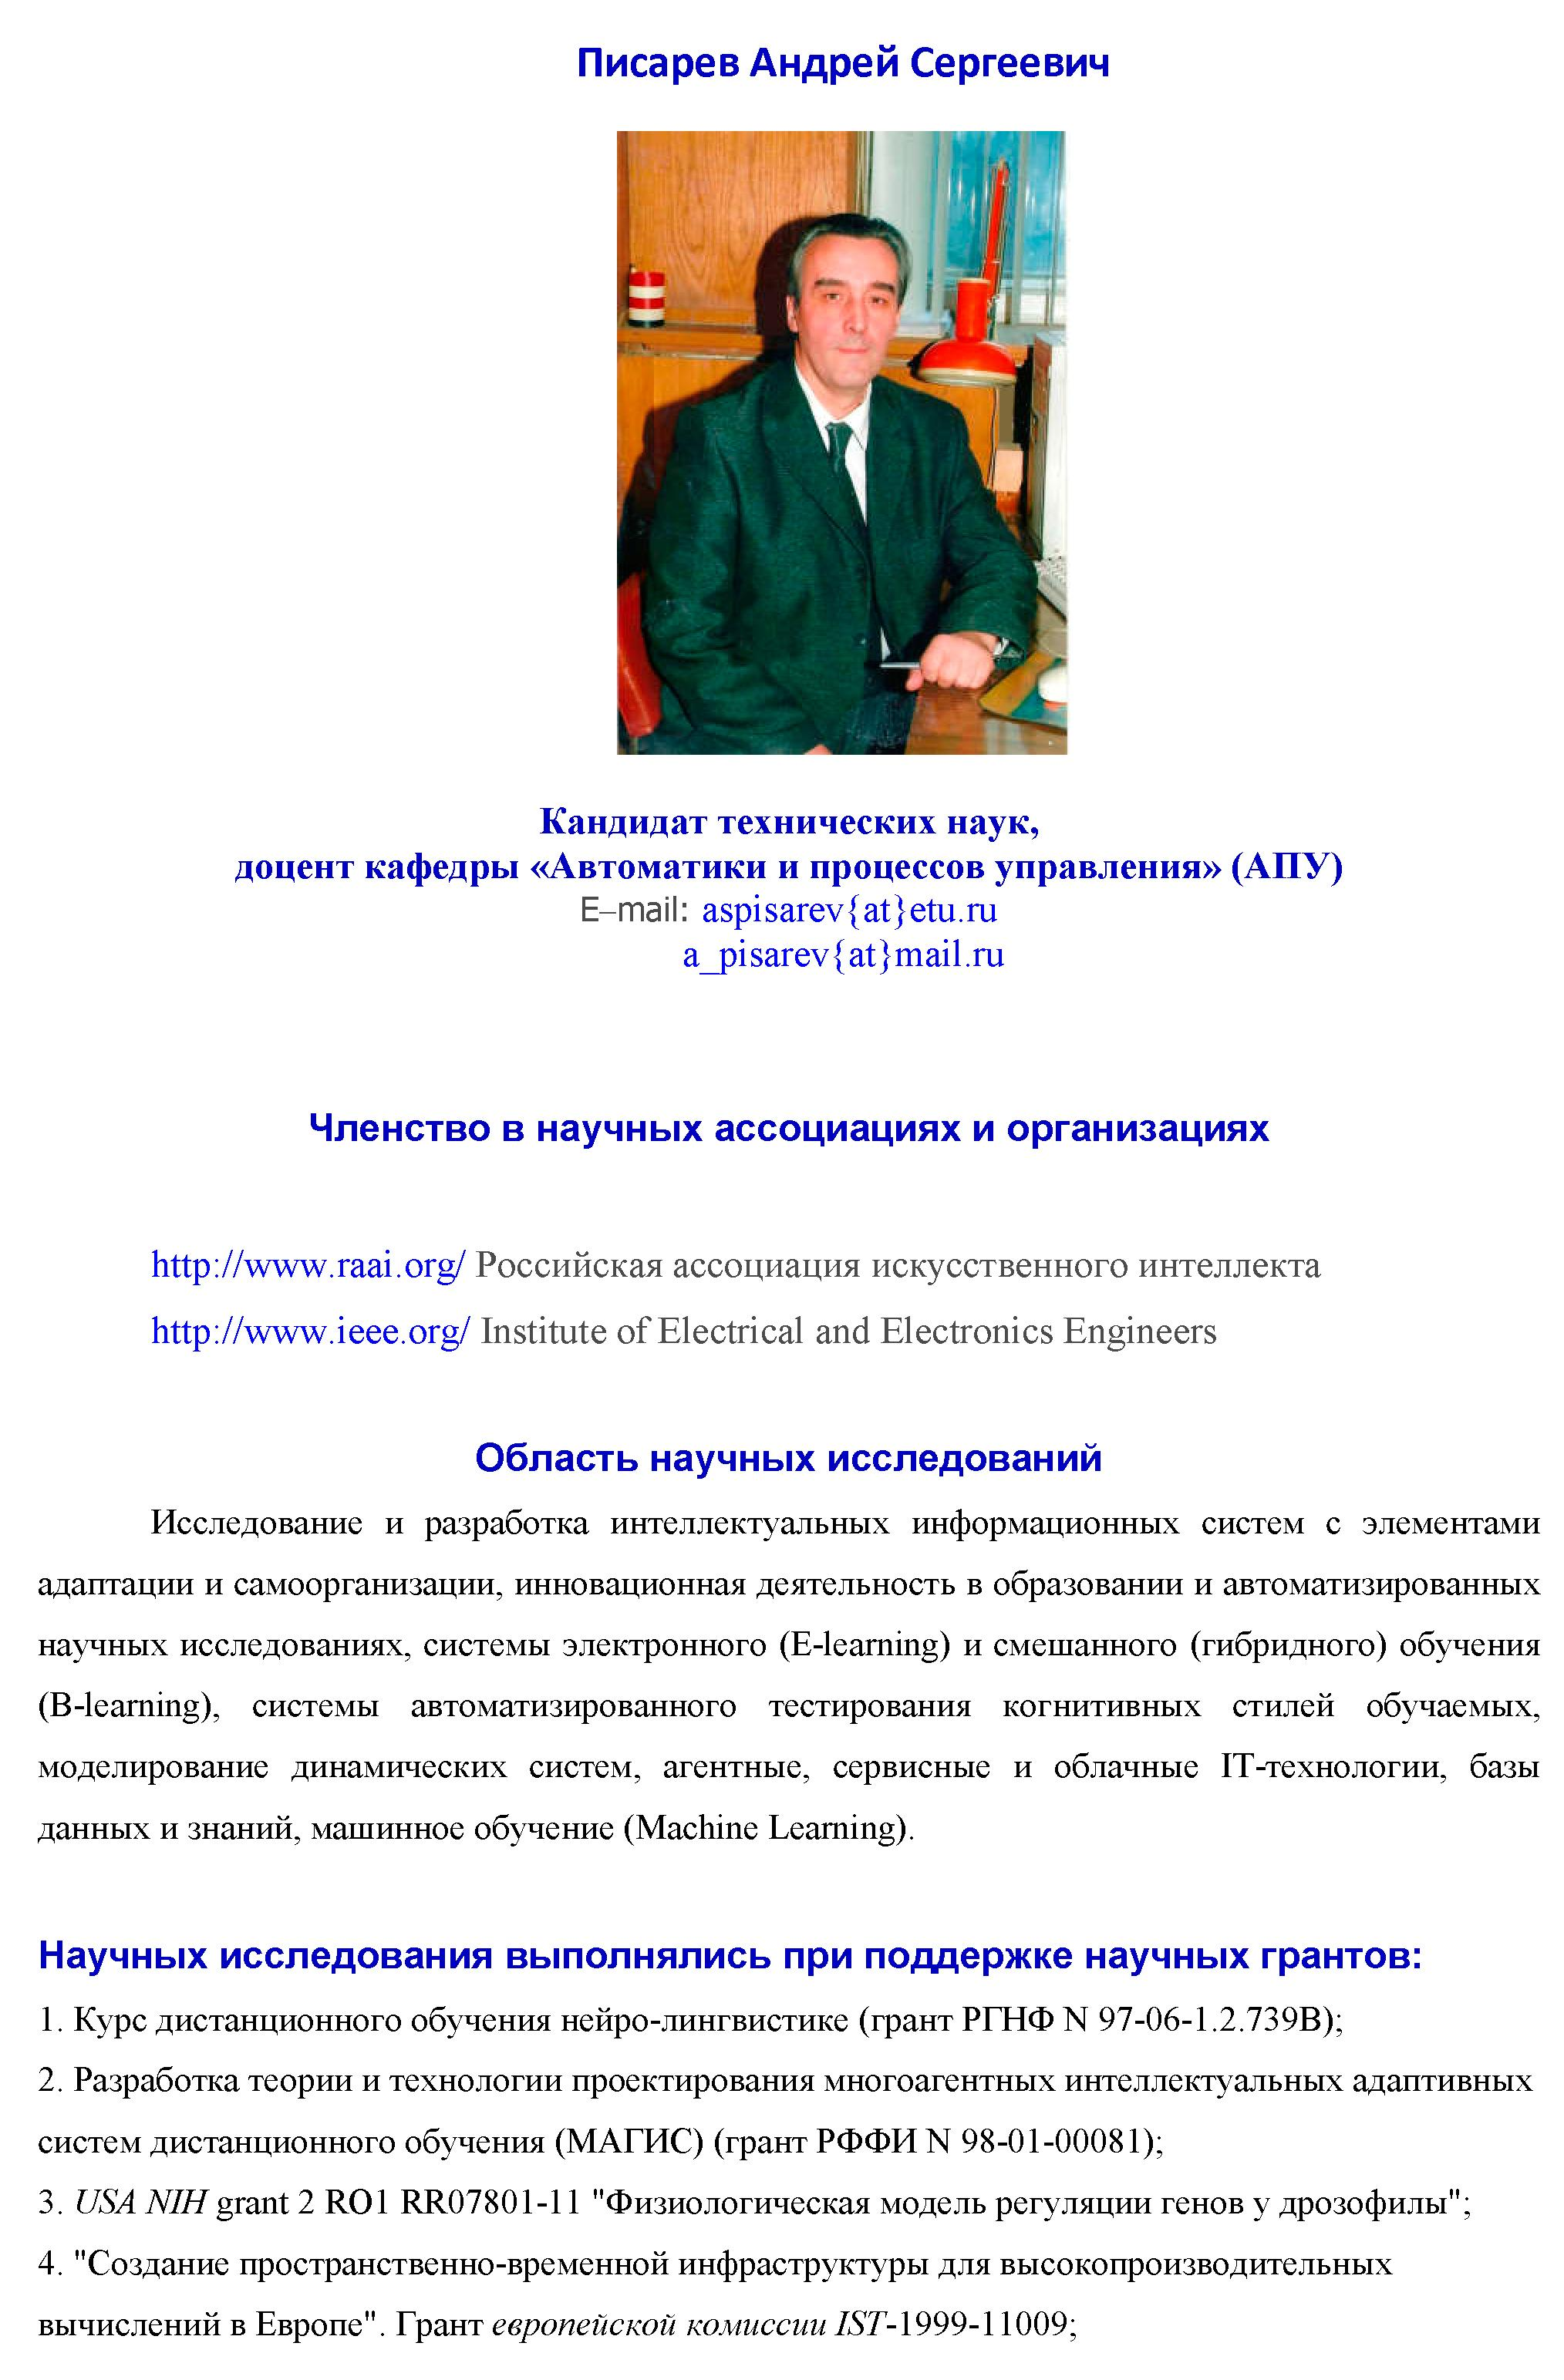 biography0001